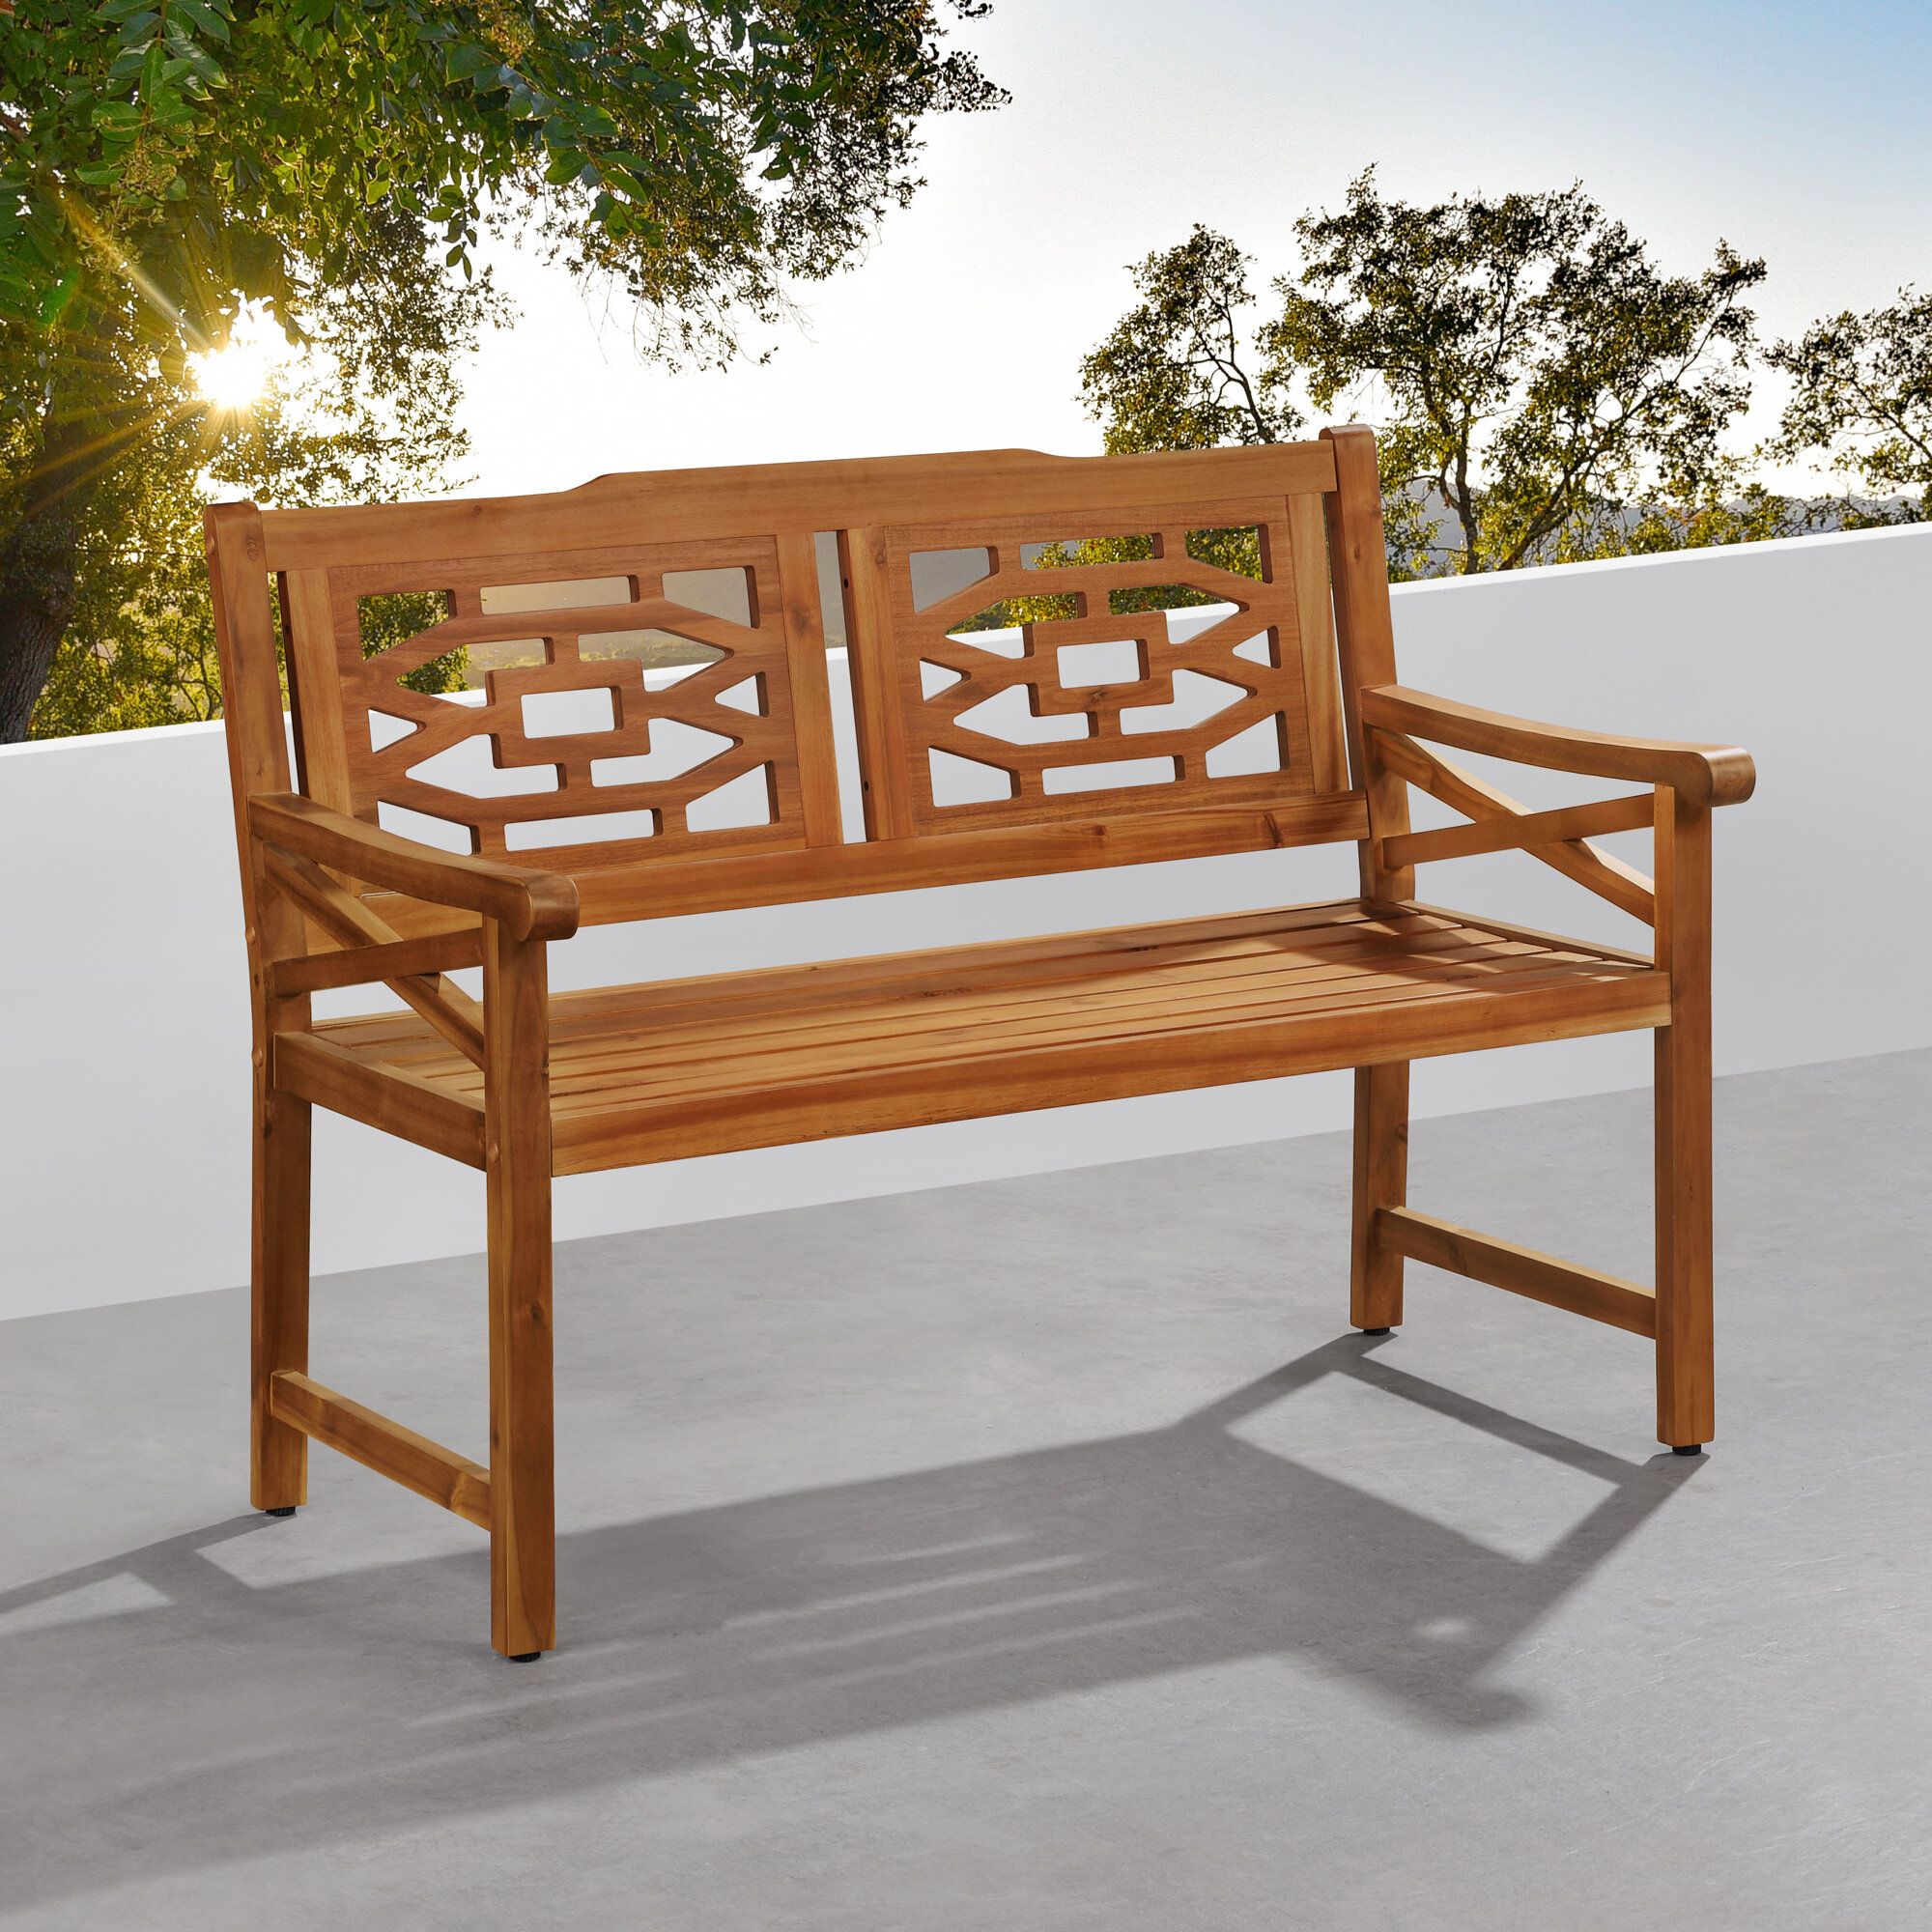 Malay Wooden Garden Bench With Regard To Amabel Patio Diamond Wooden Garden Benches (View 13 of 25)